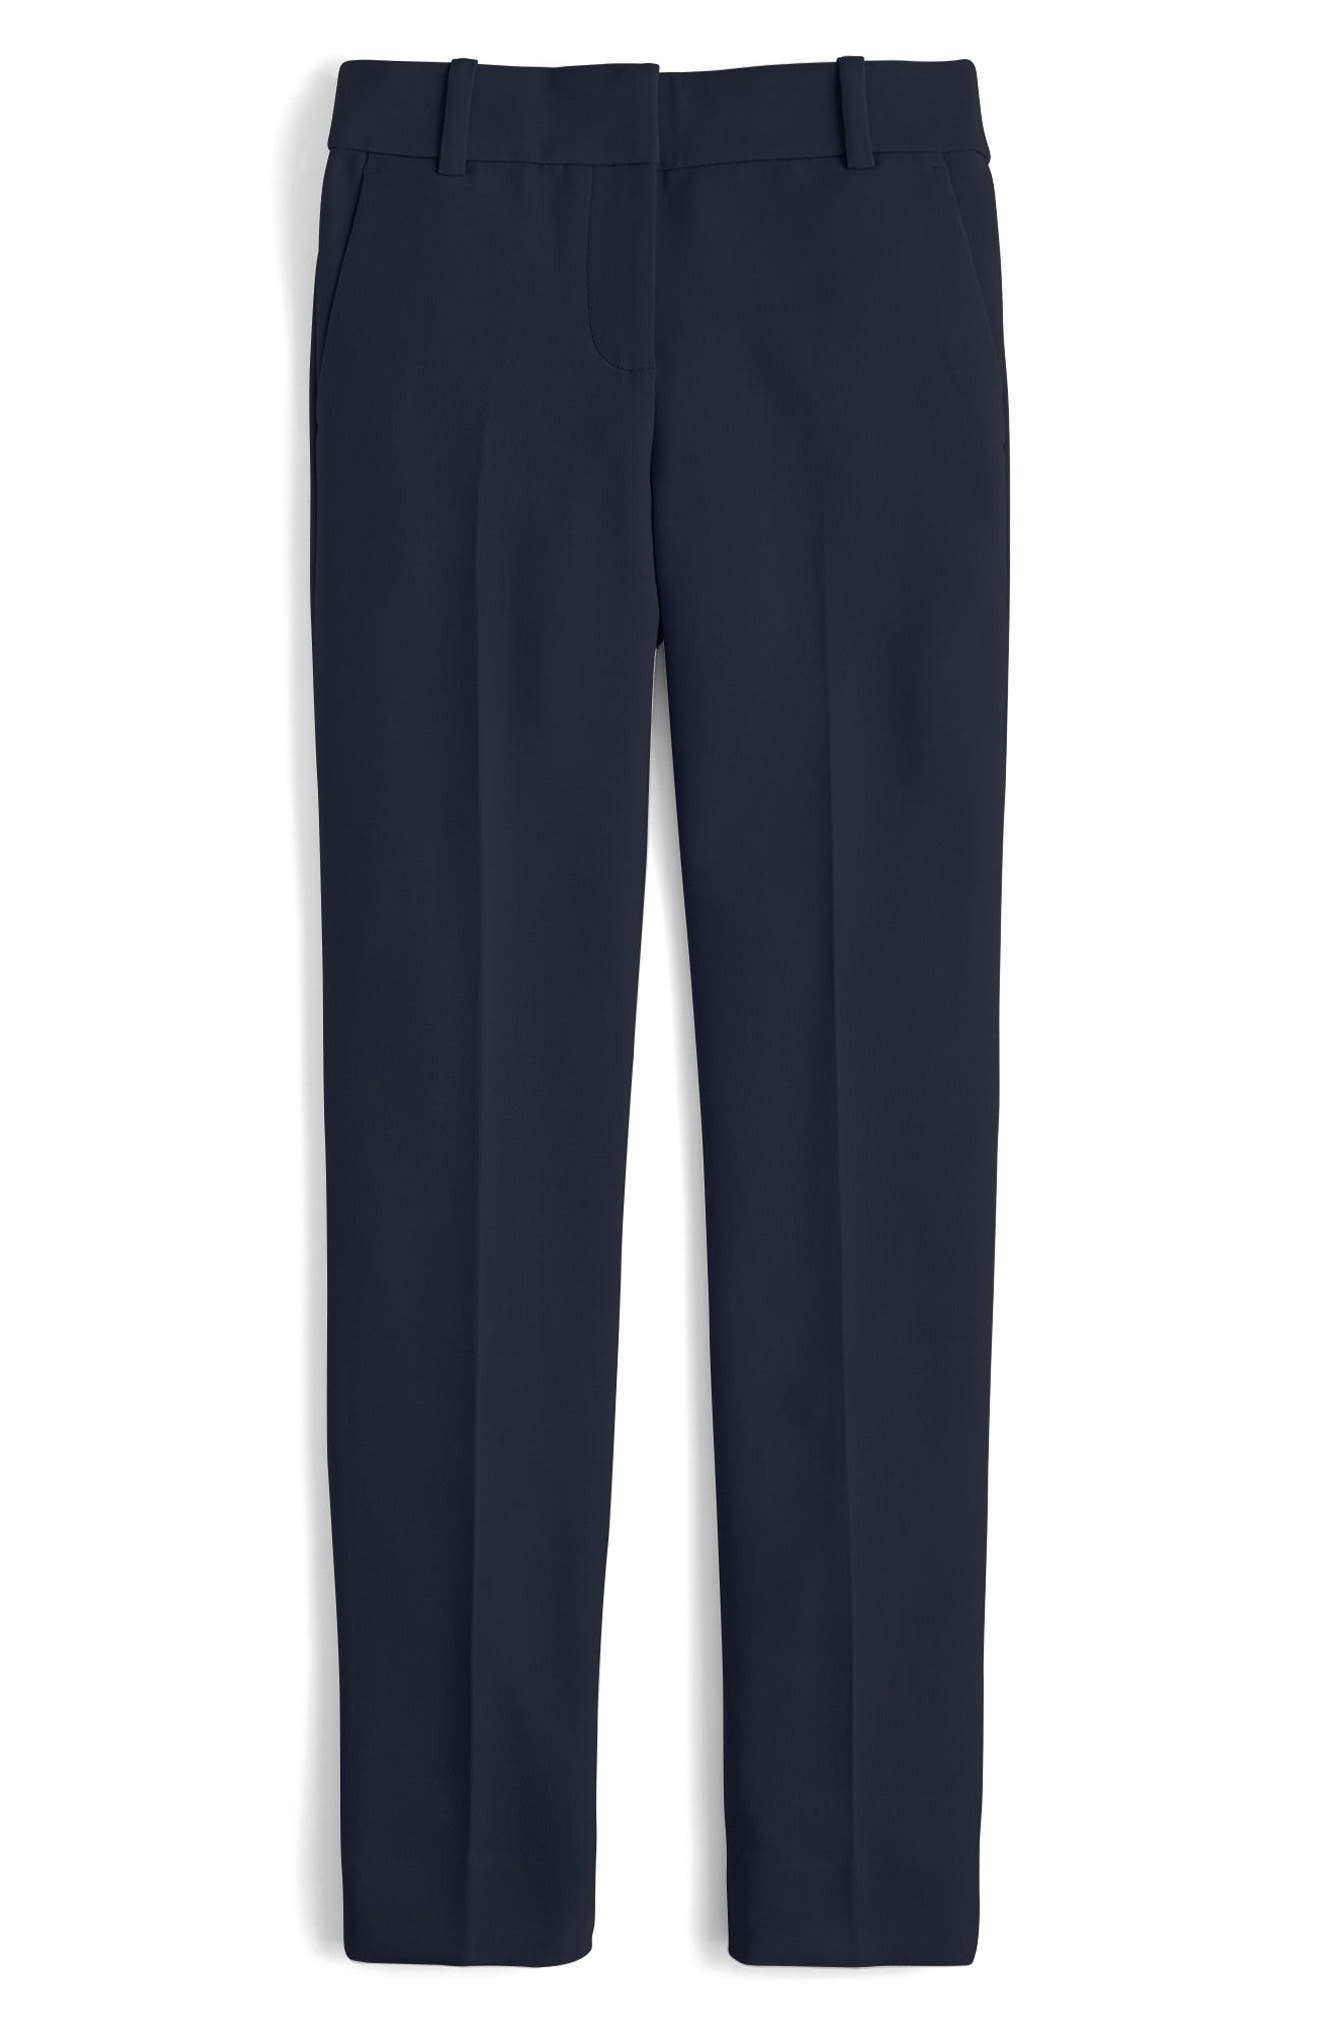 Alternate Image 1 Selected - J.Crew Cameron Four Season Crop Pants (Regular & Petite)